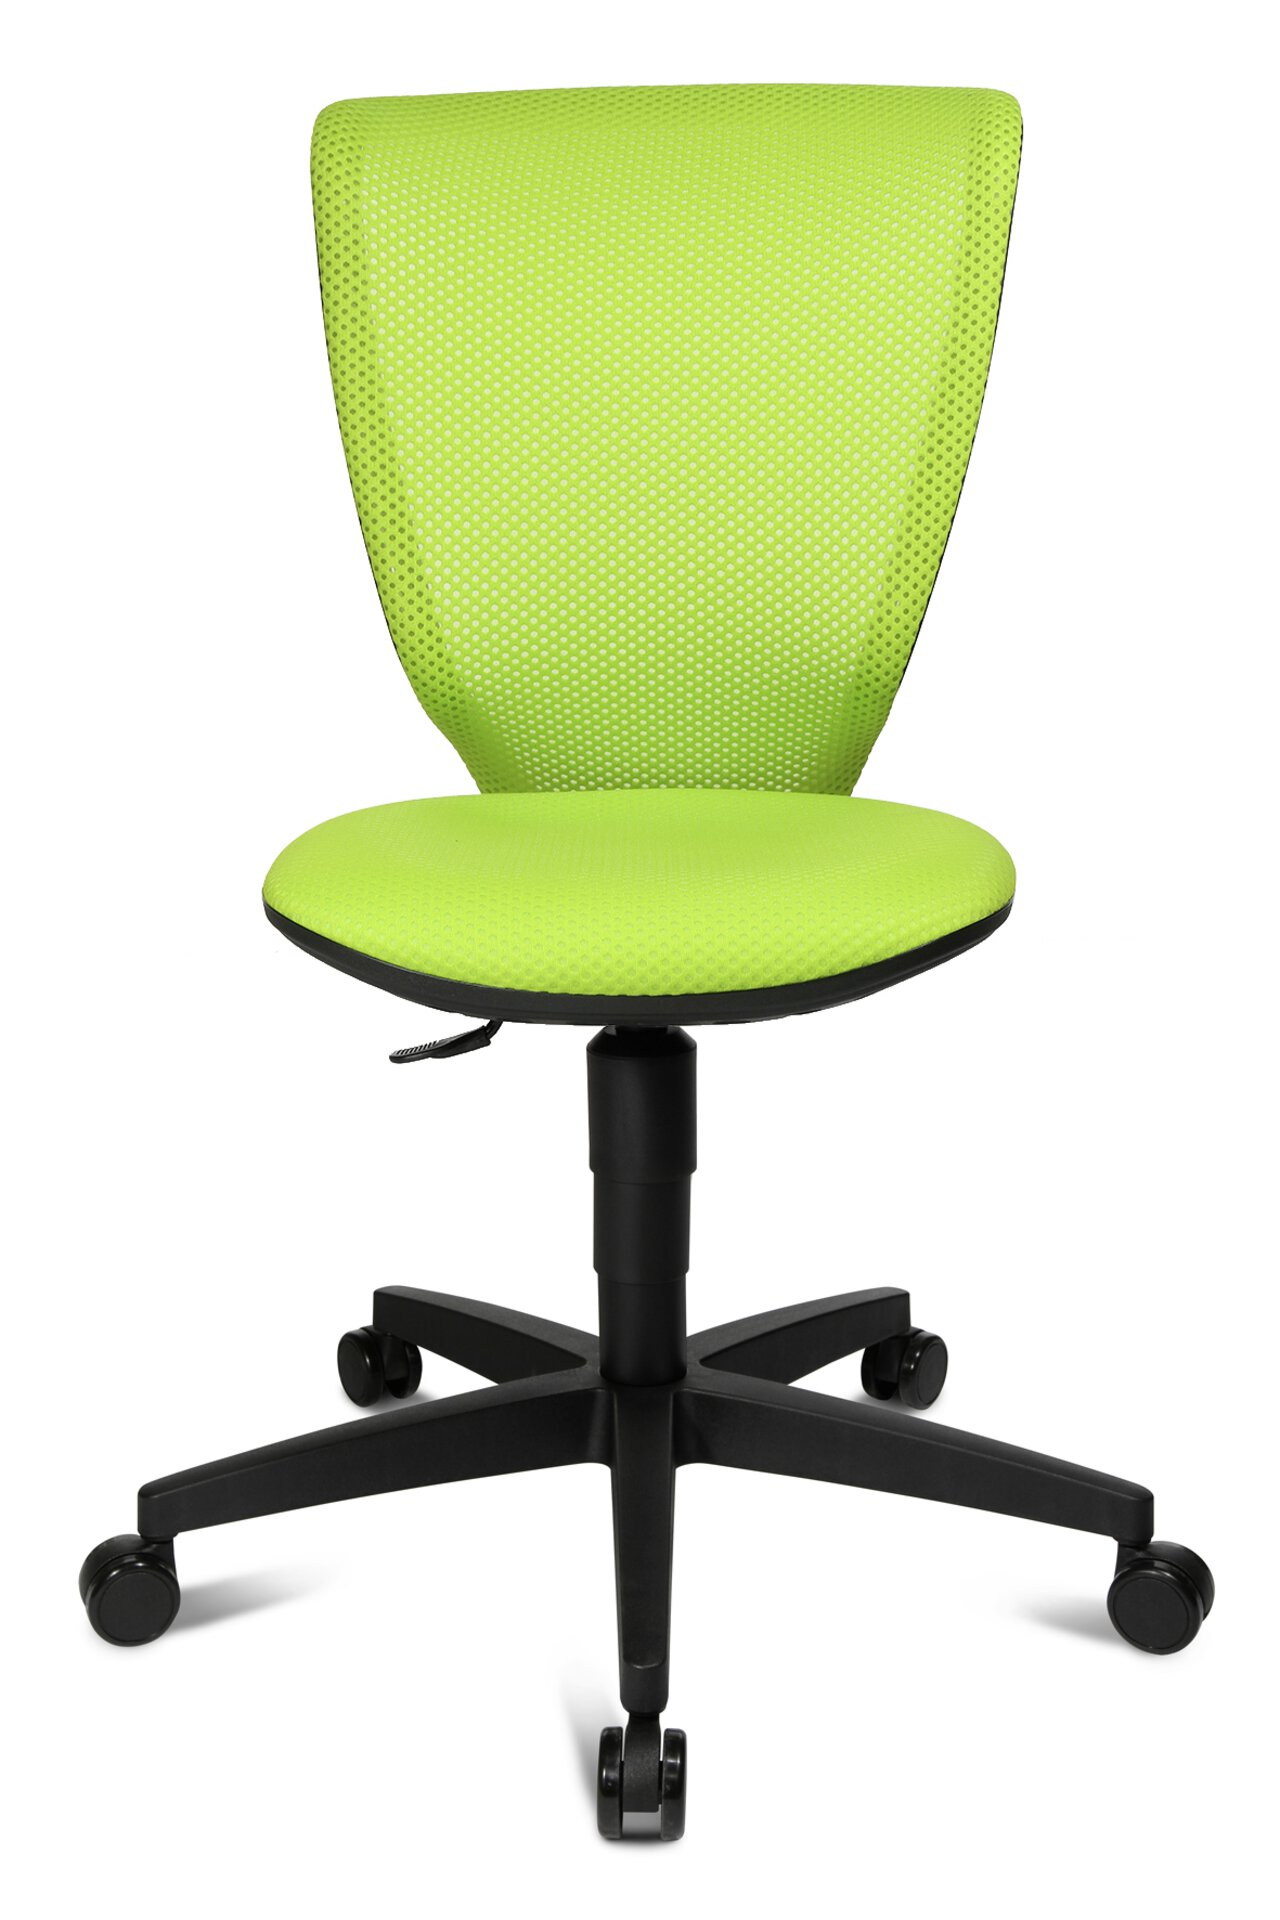 Kinderstuhl SPIDER KID Topstar Textil grün 40 x 98 x 44 cm